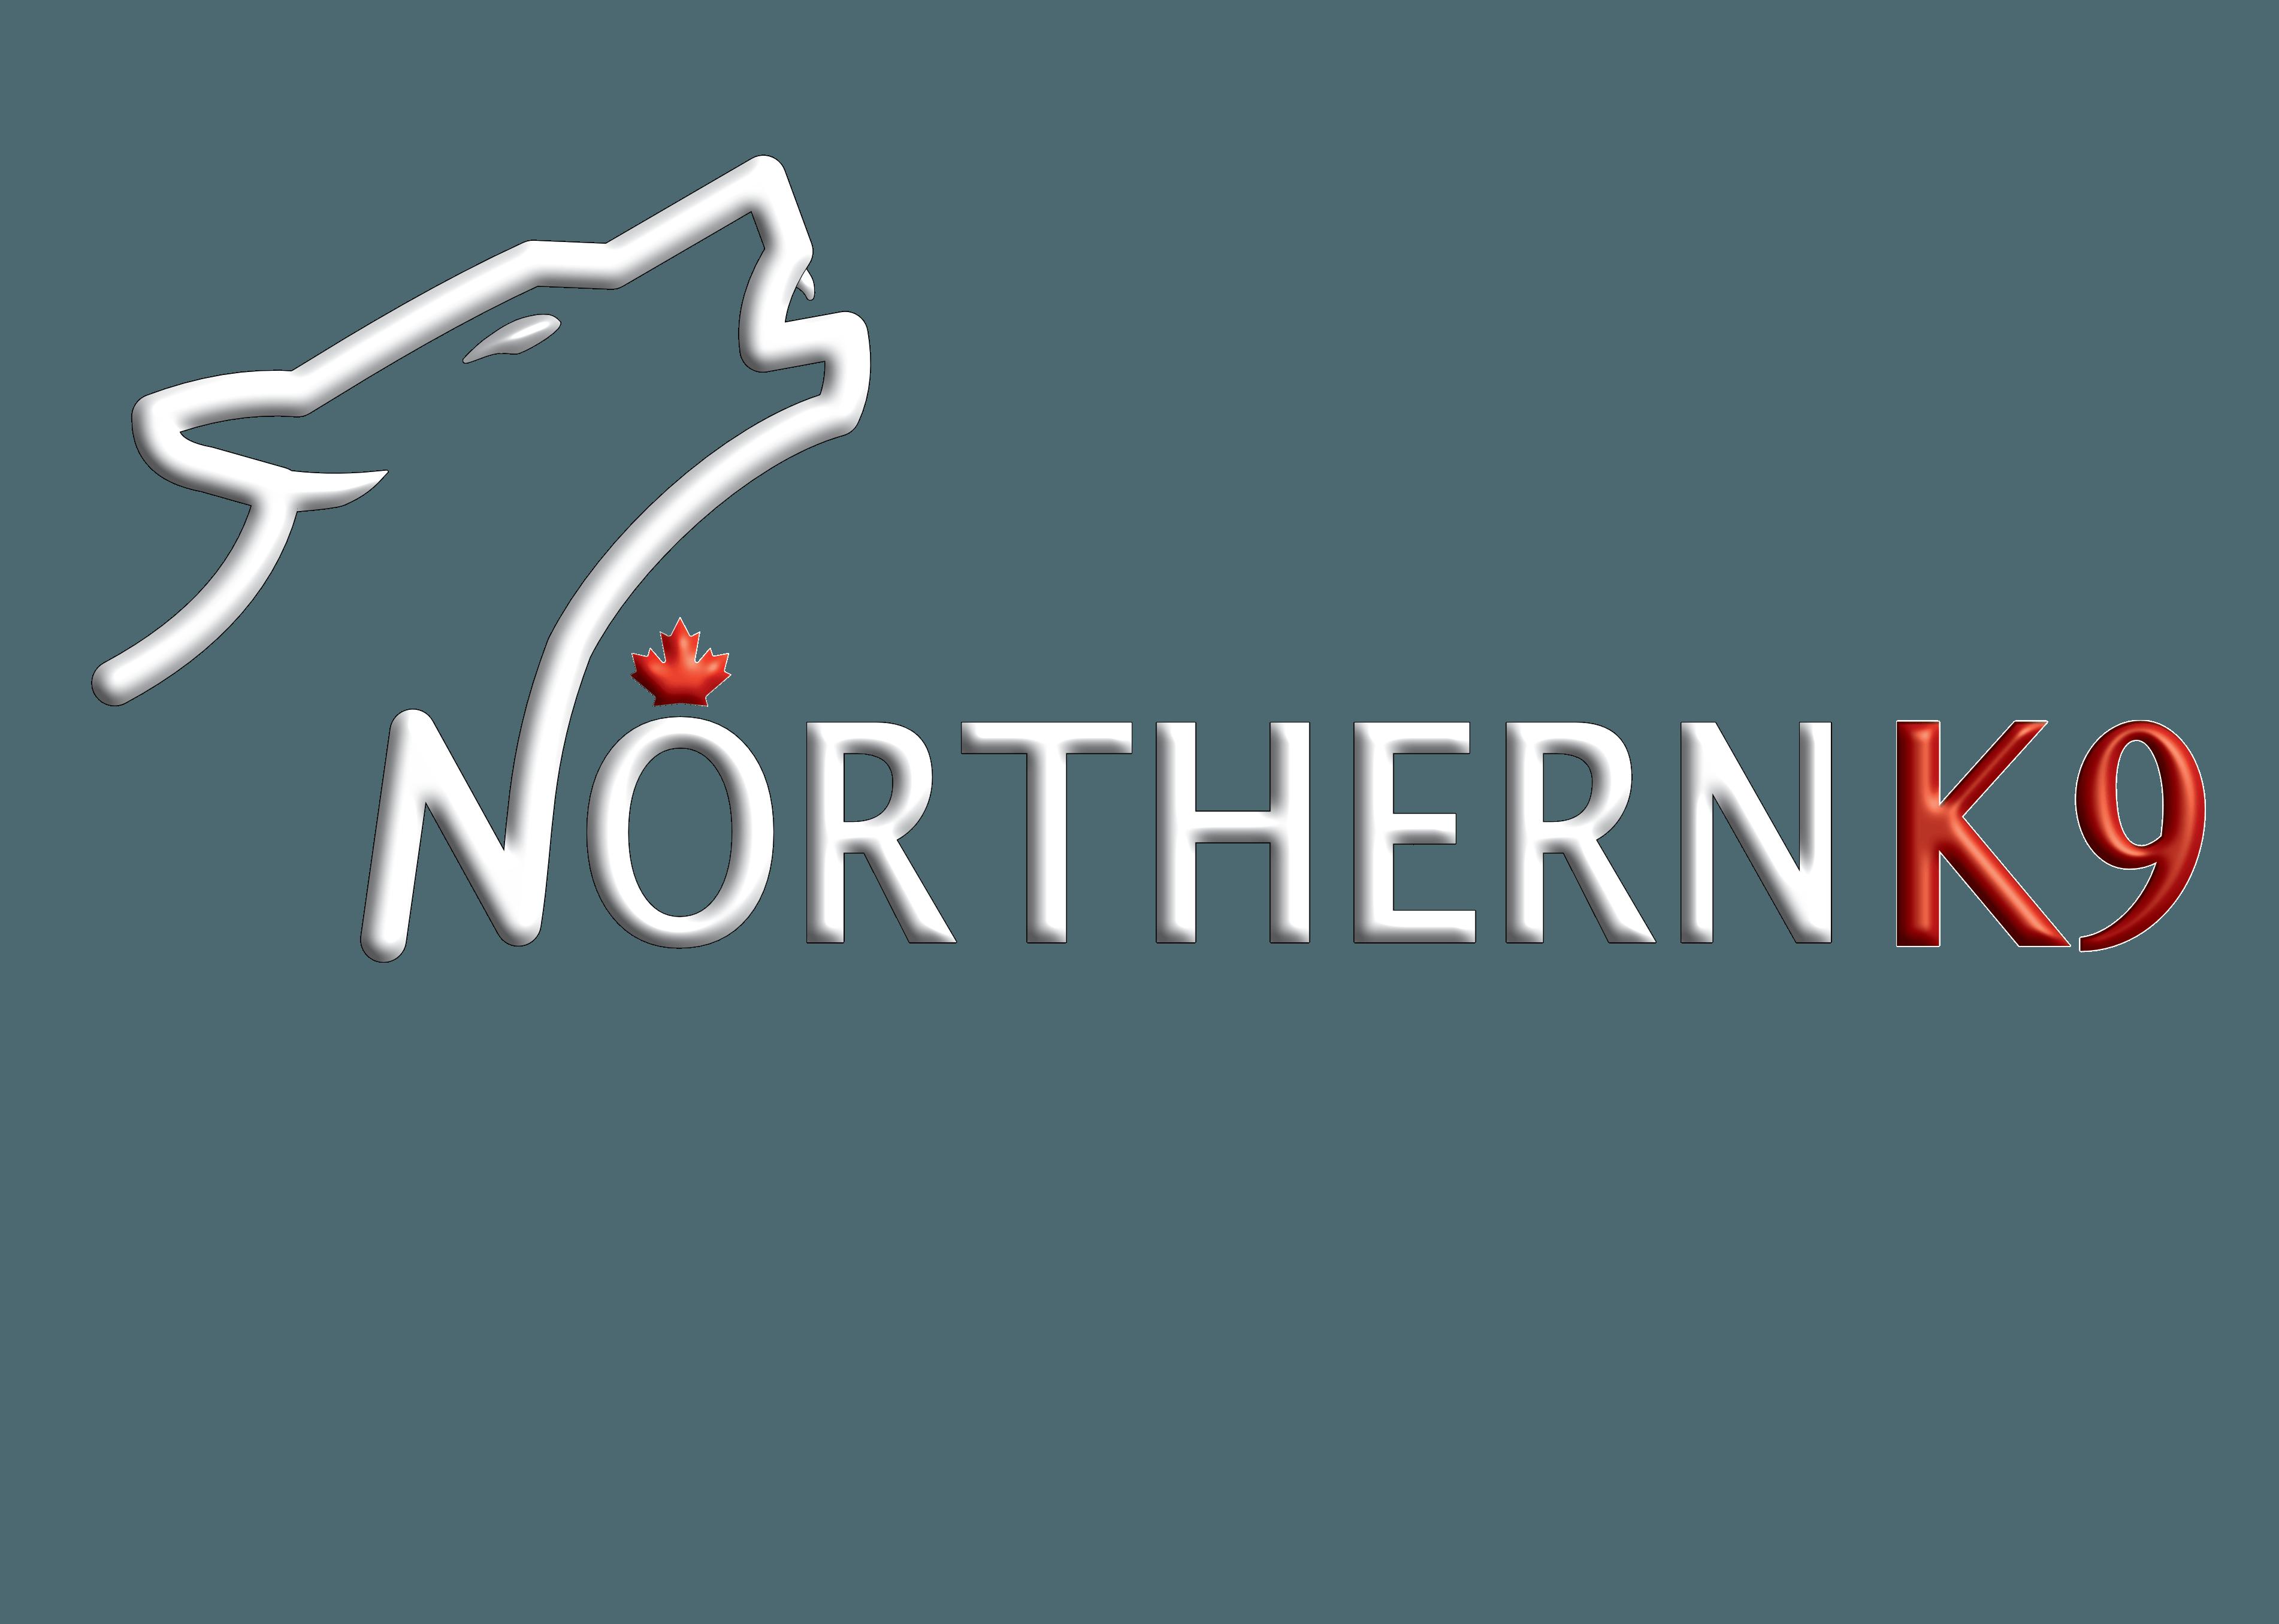 Northern K9